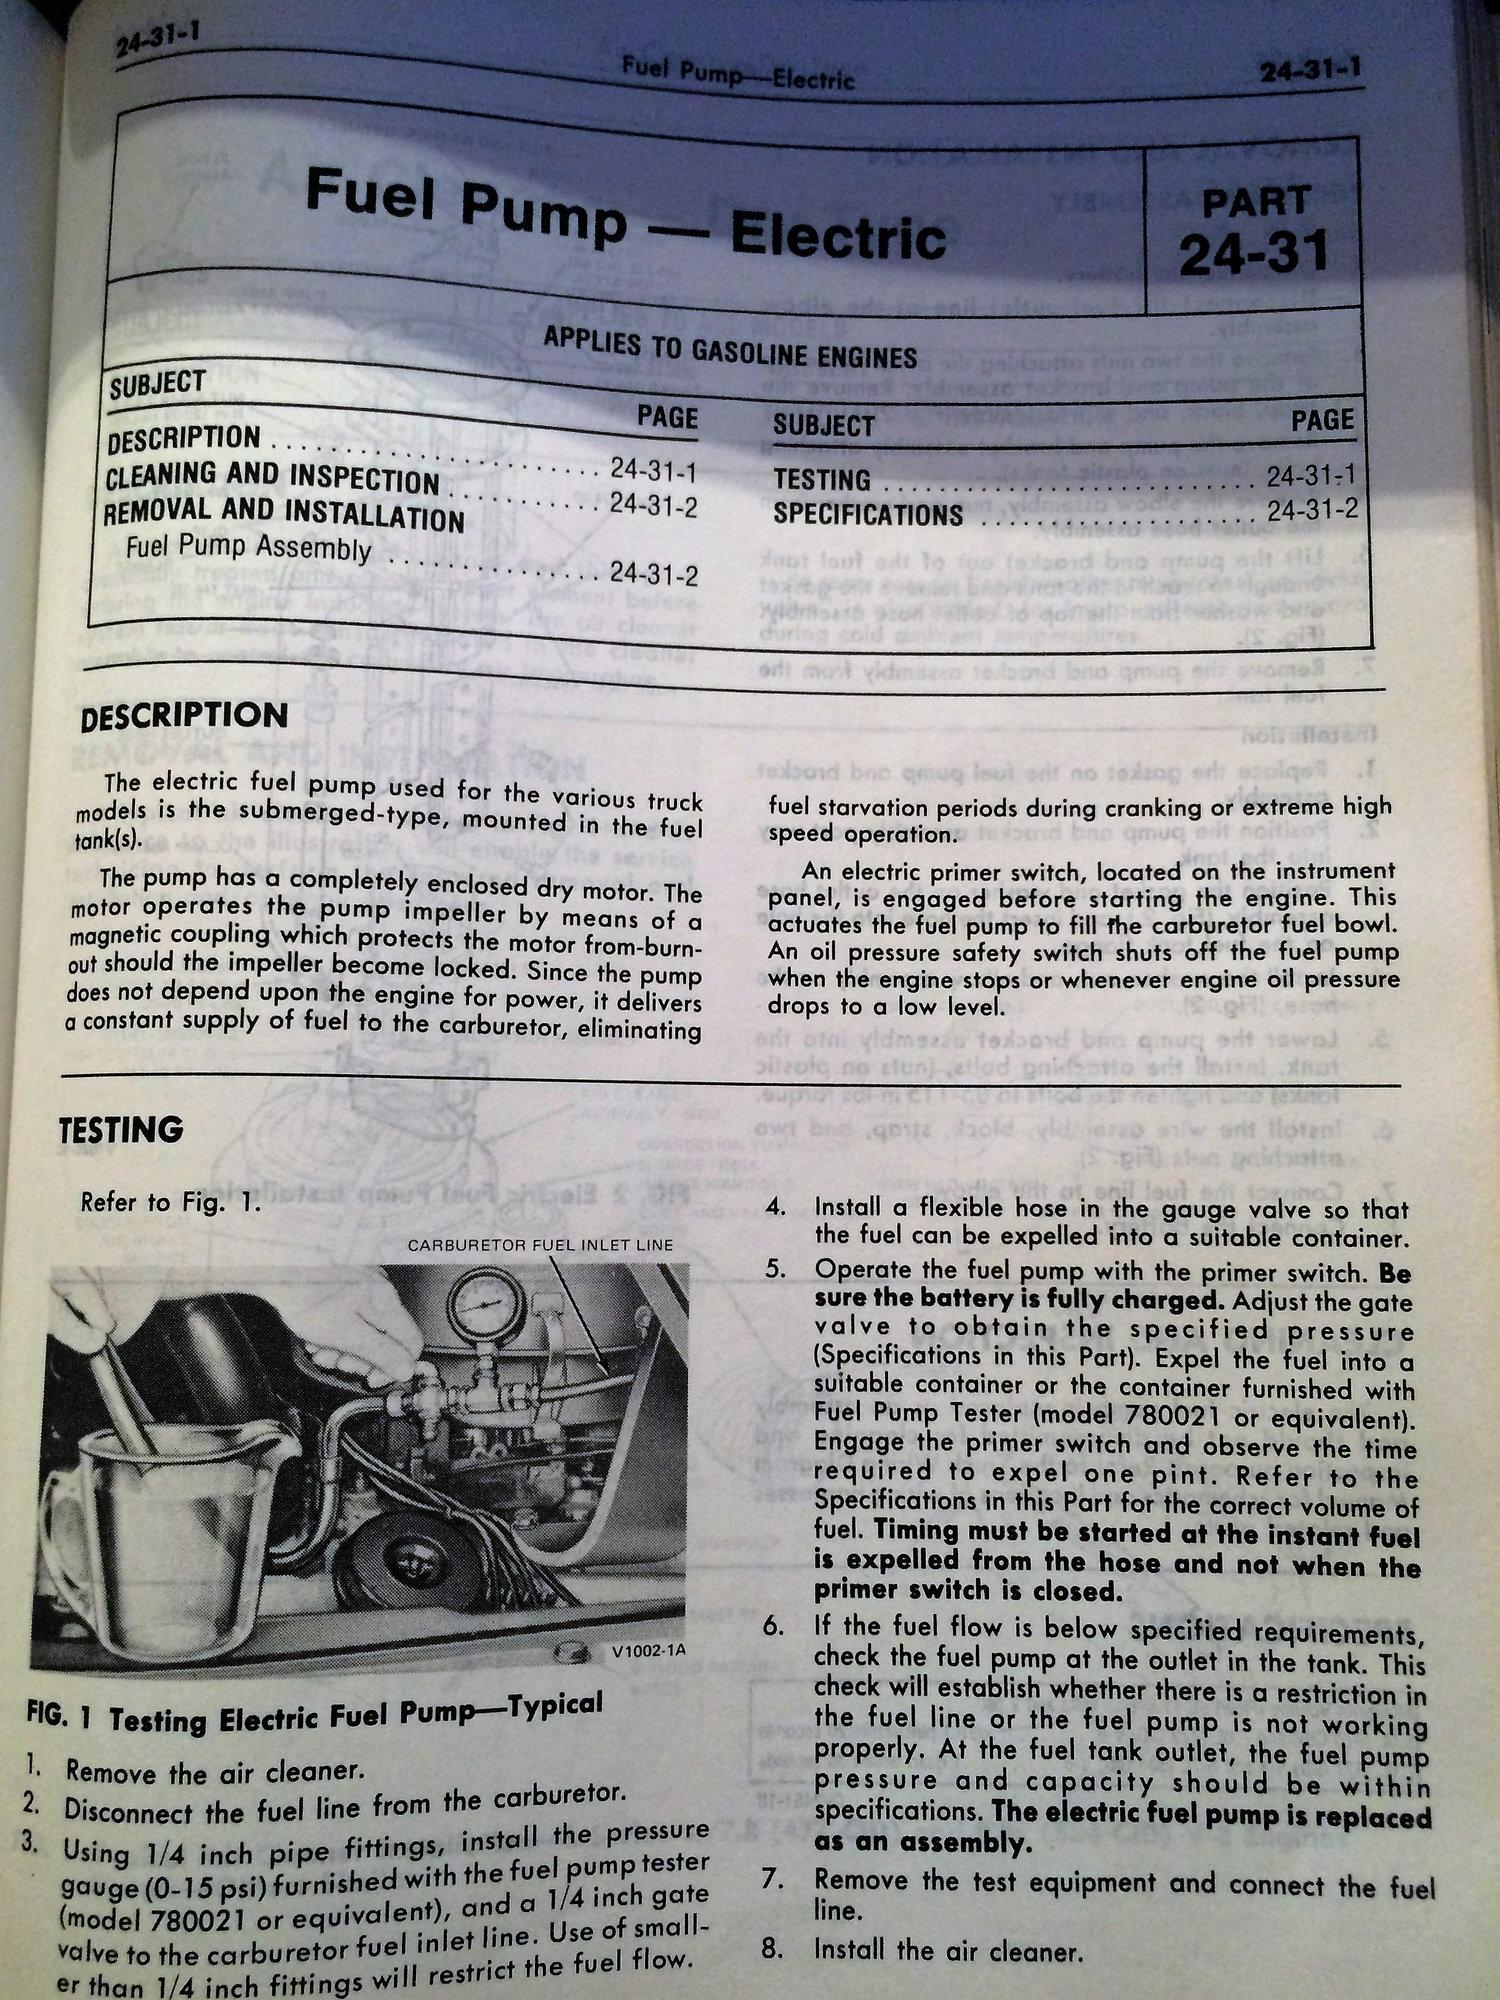 1986 Ford Mustang Wiring Diagram 1986 Circuit Diagrams